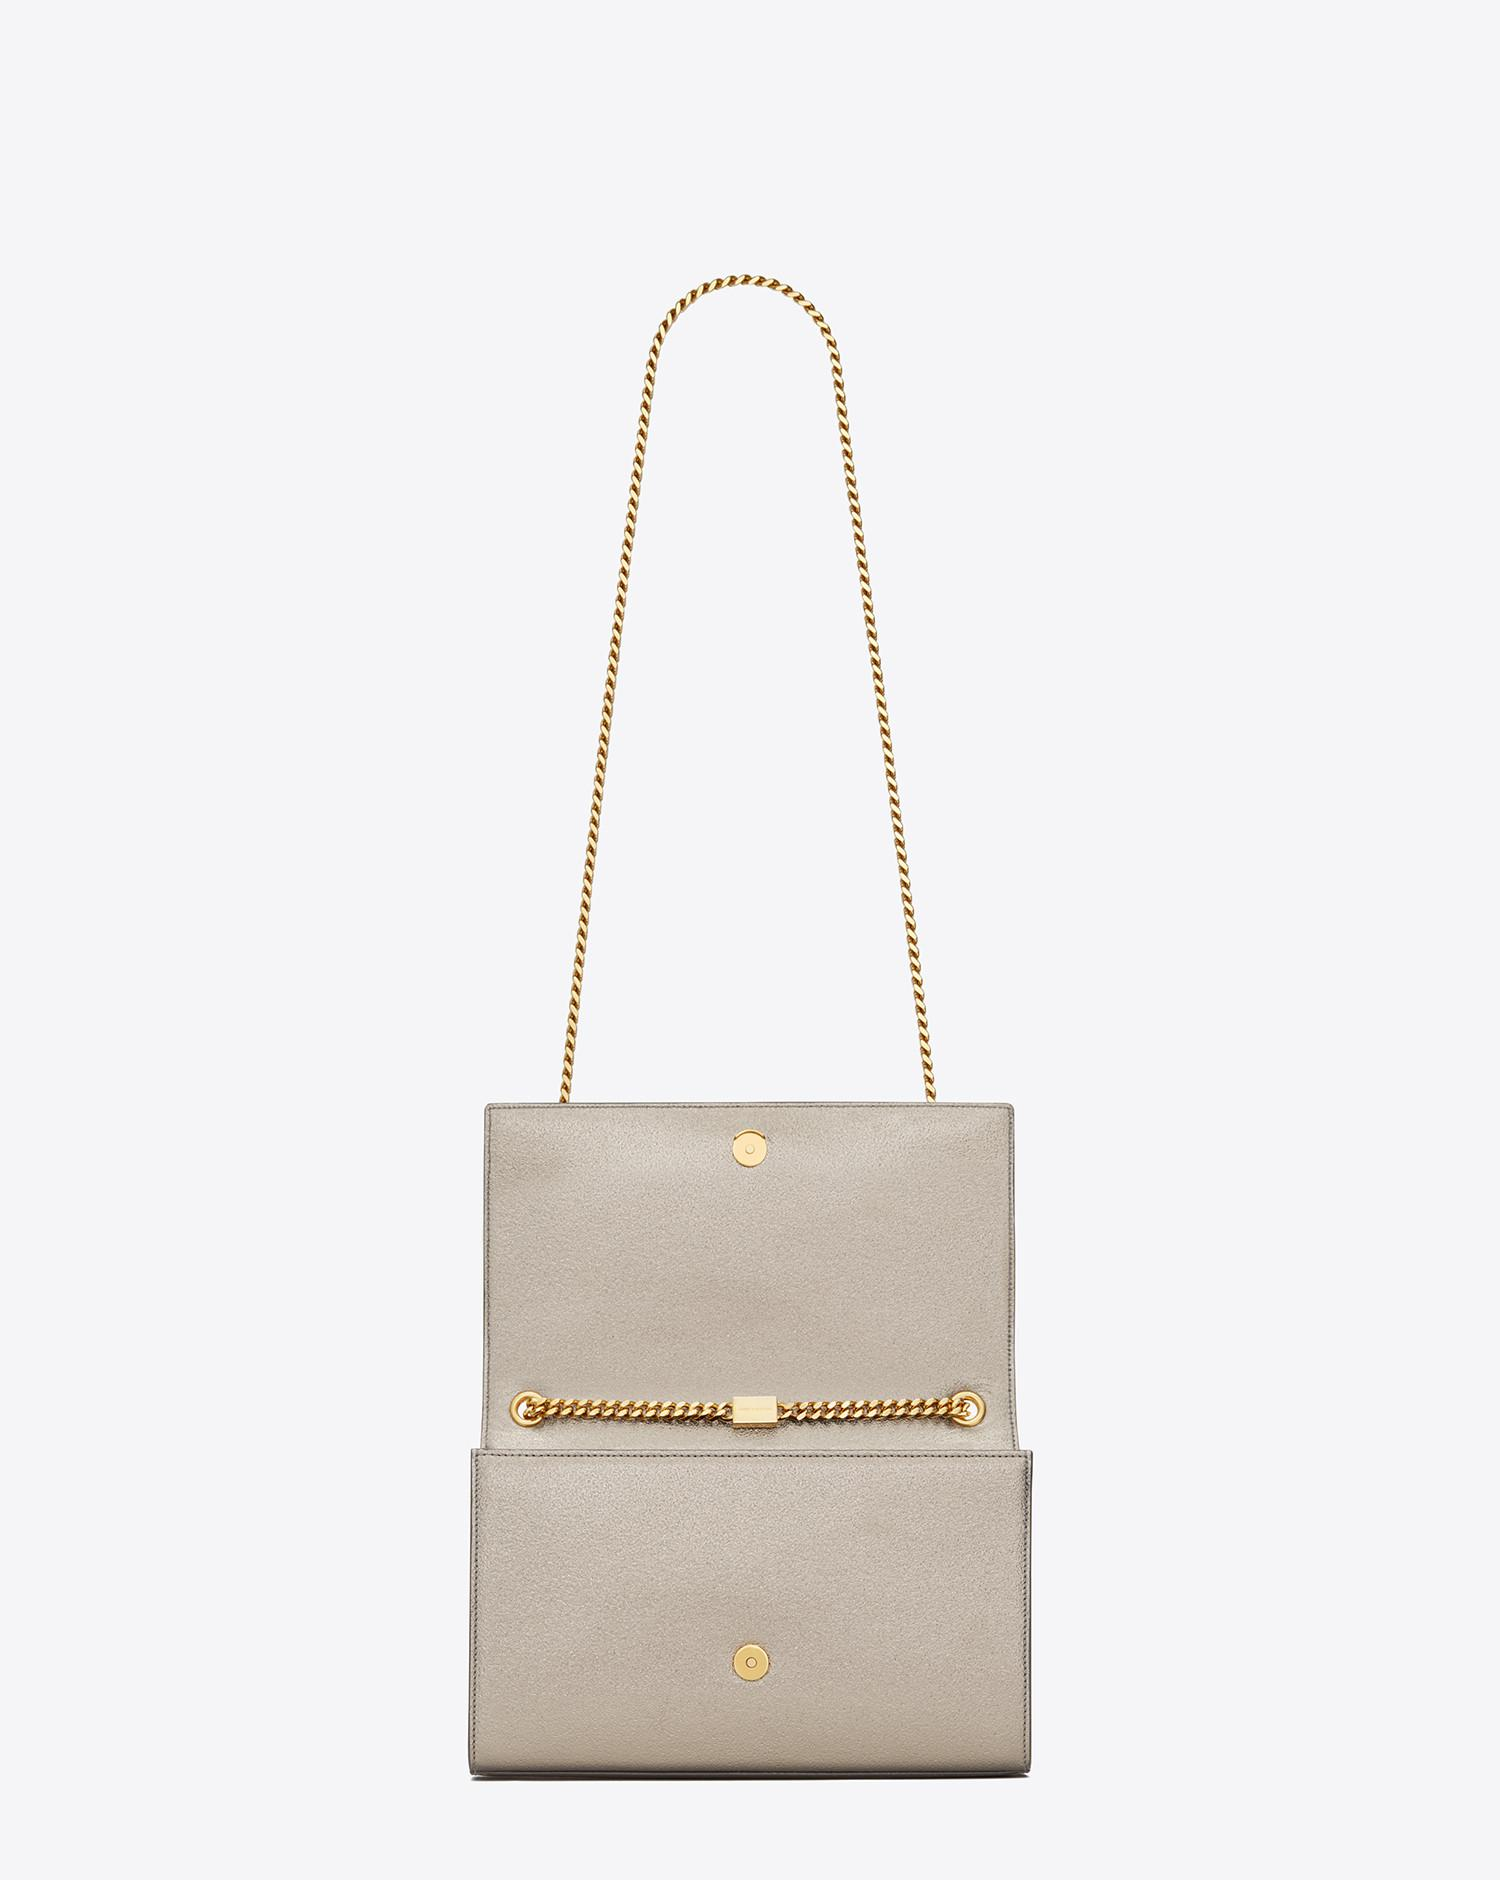 Lyst - Saint Laurent Classic Medium Kate Satchel In Pale Gold Grained  Metallic Leather in Metallic feec8291d5727